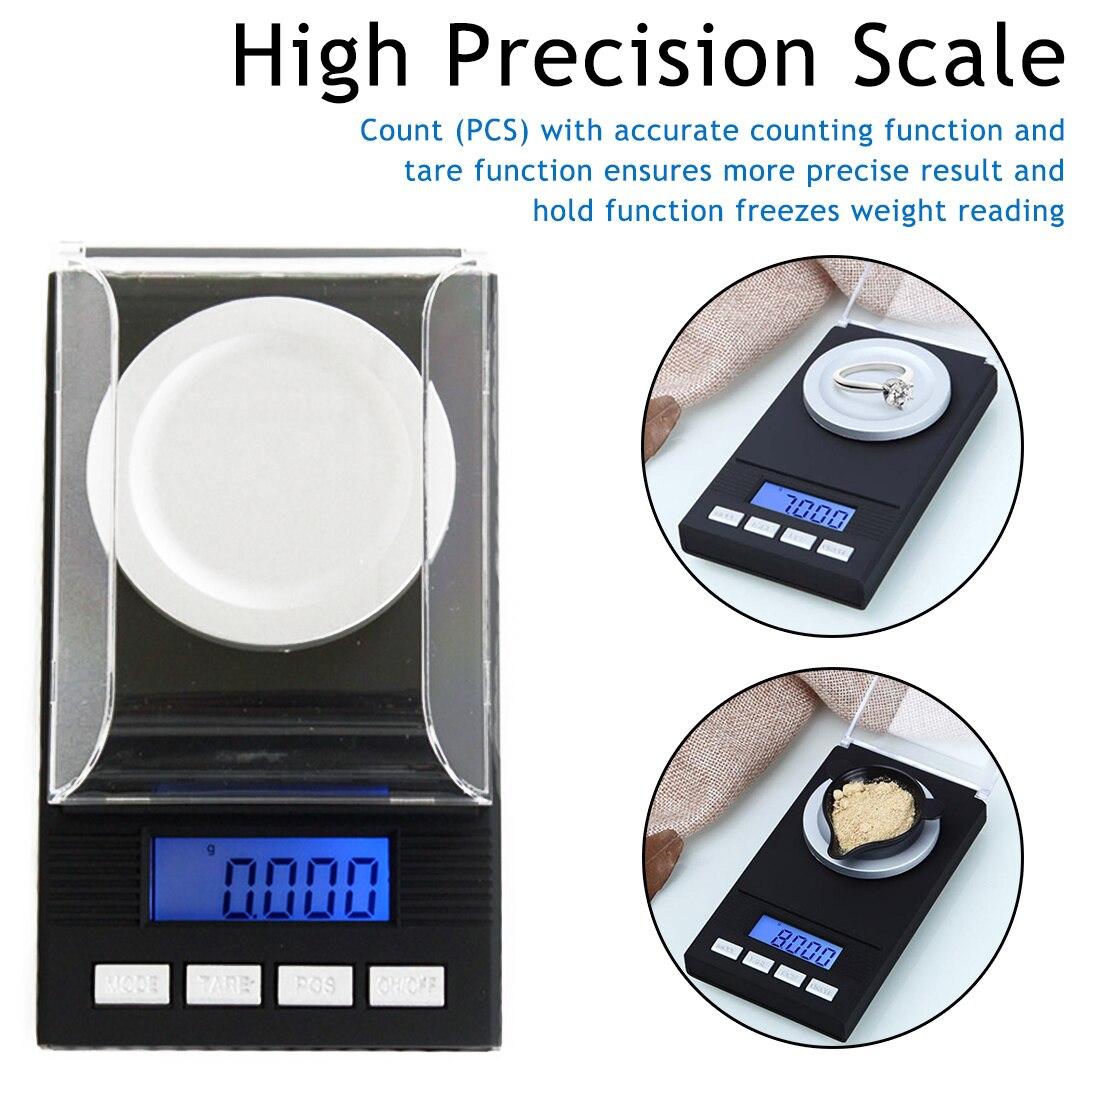 High Precision Portable Mini 20g/50g/100g/0.001g Digital Scale LCD Electronic Capacity Balance Diamond Jewelry Pocket Scale